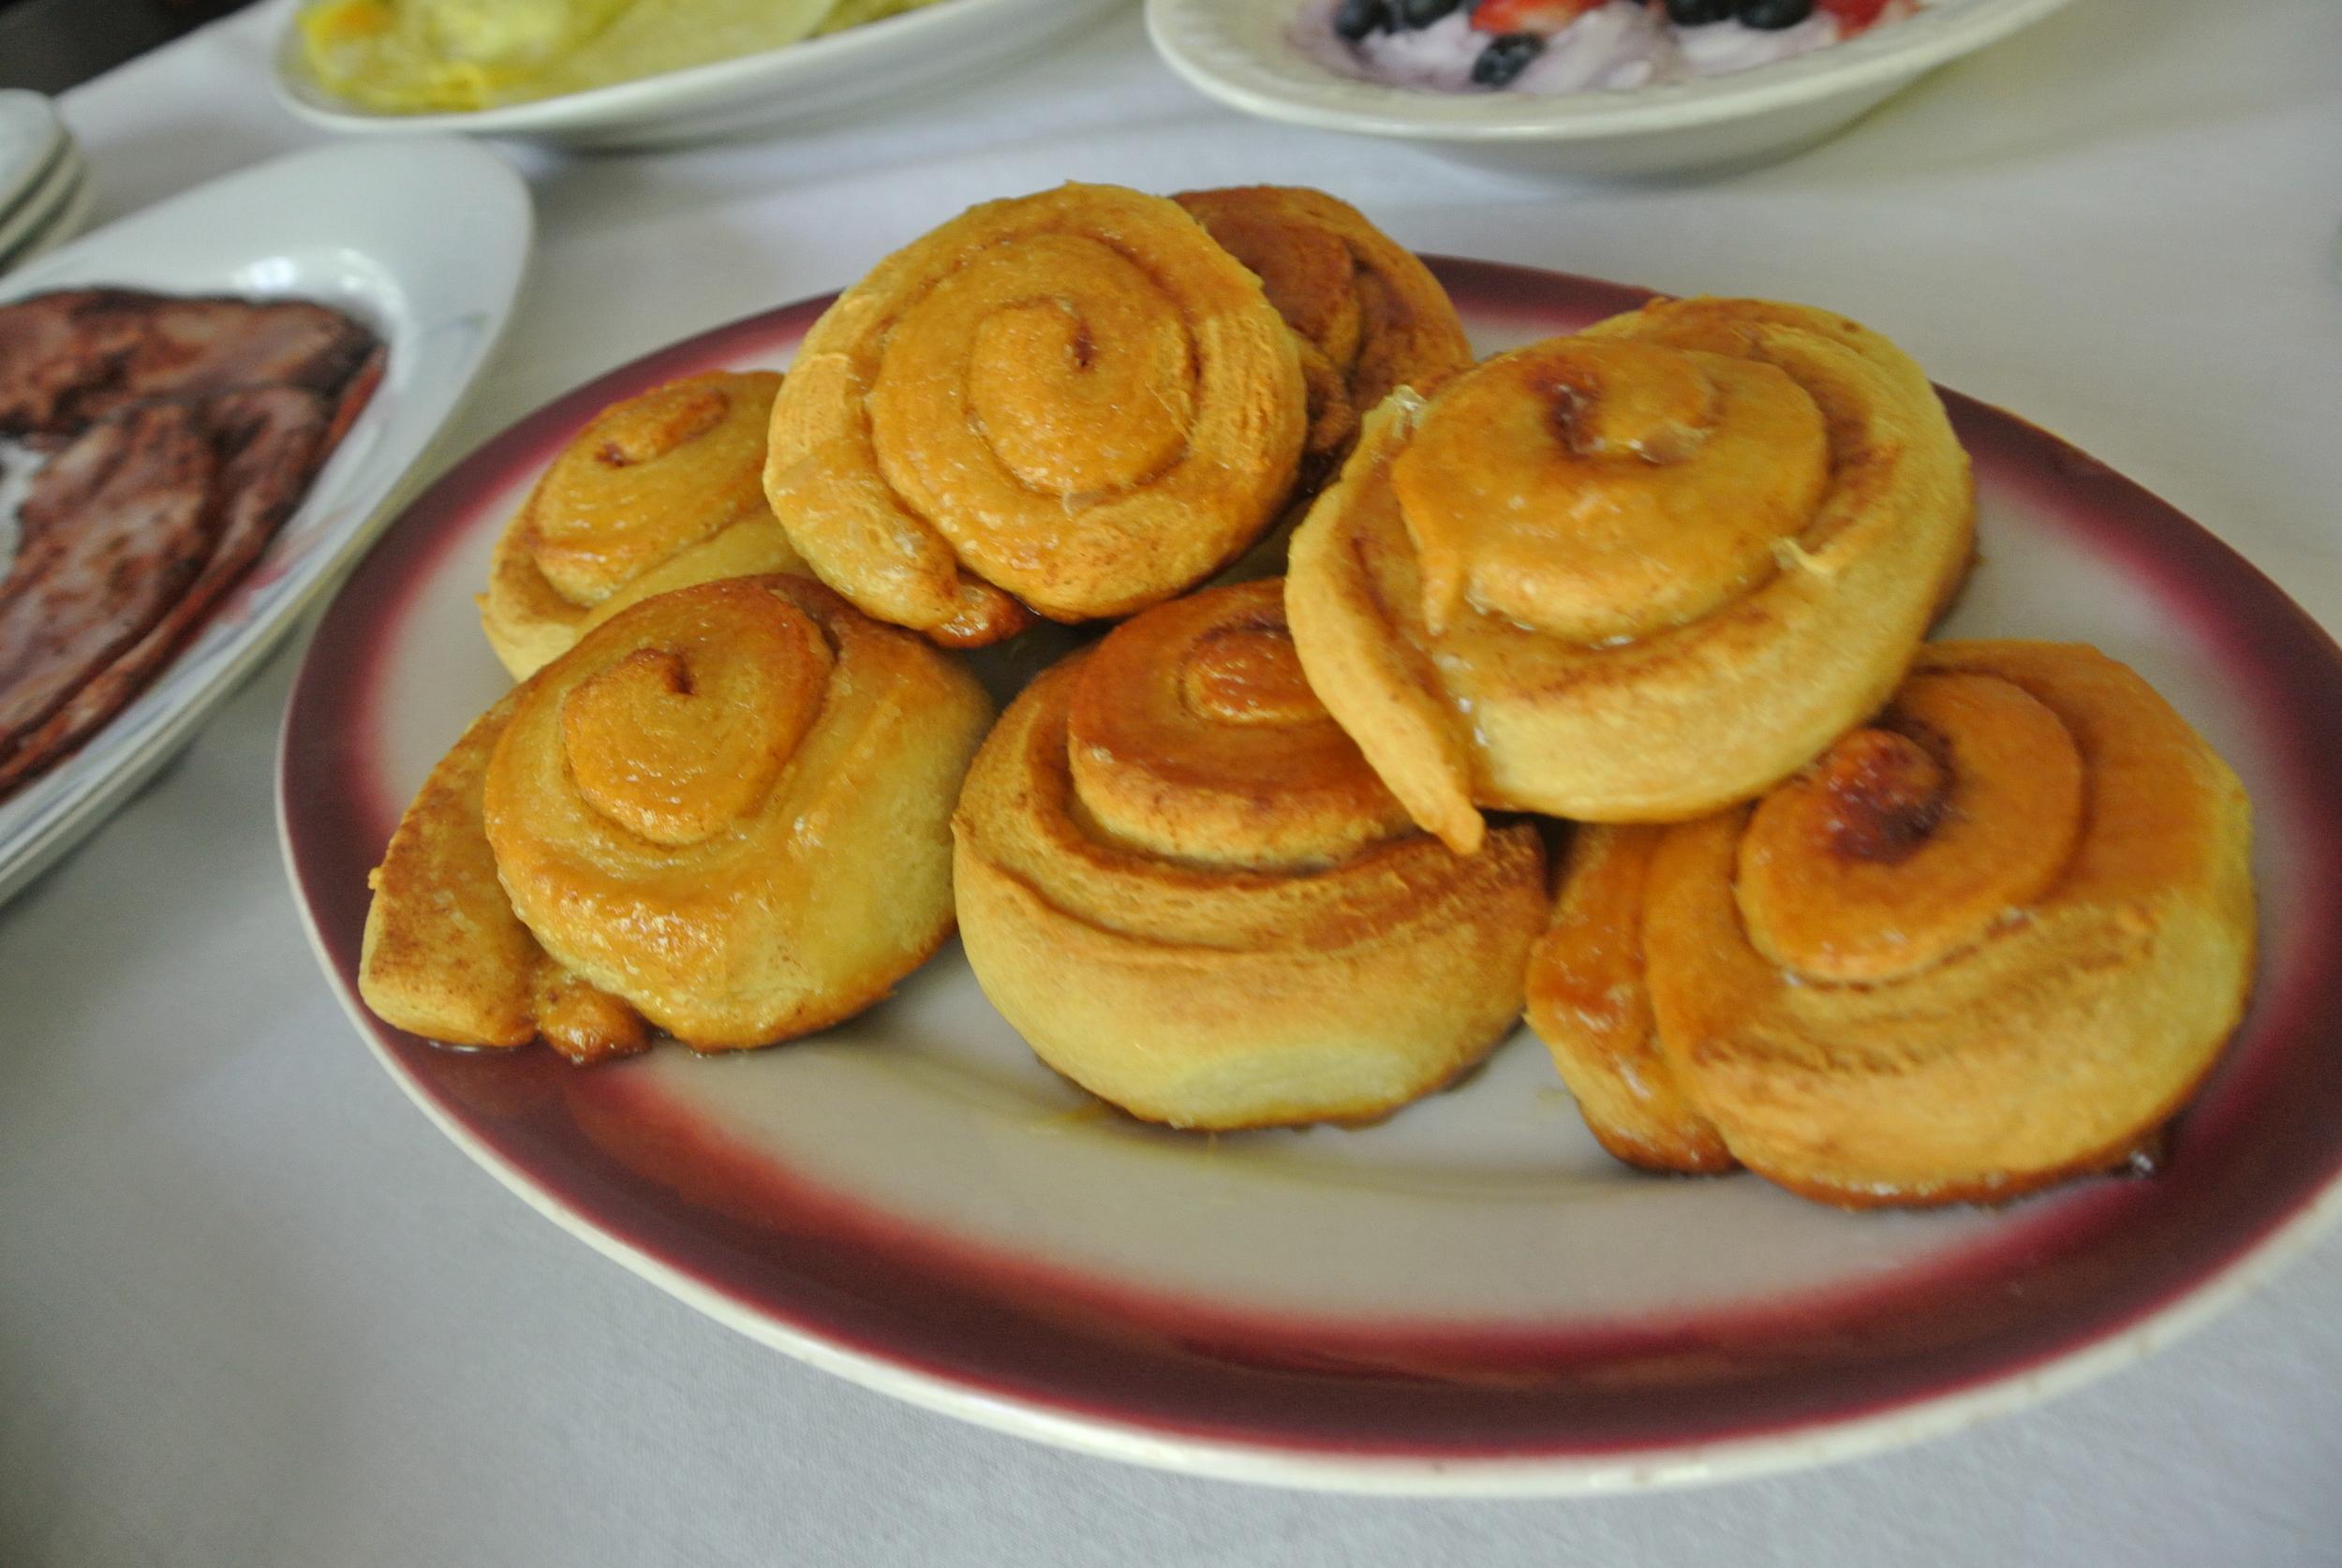 Orange glazed buns